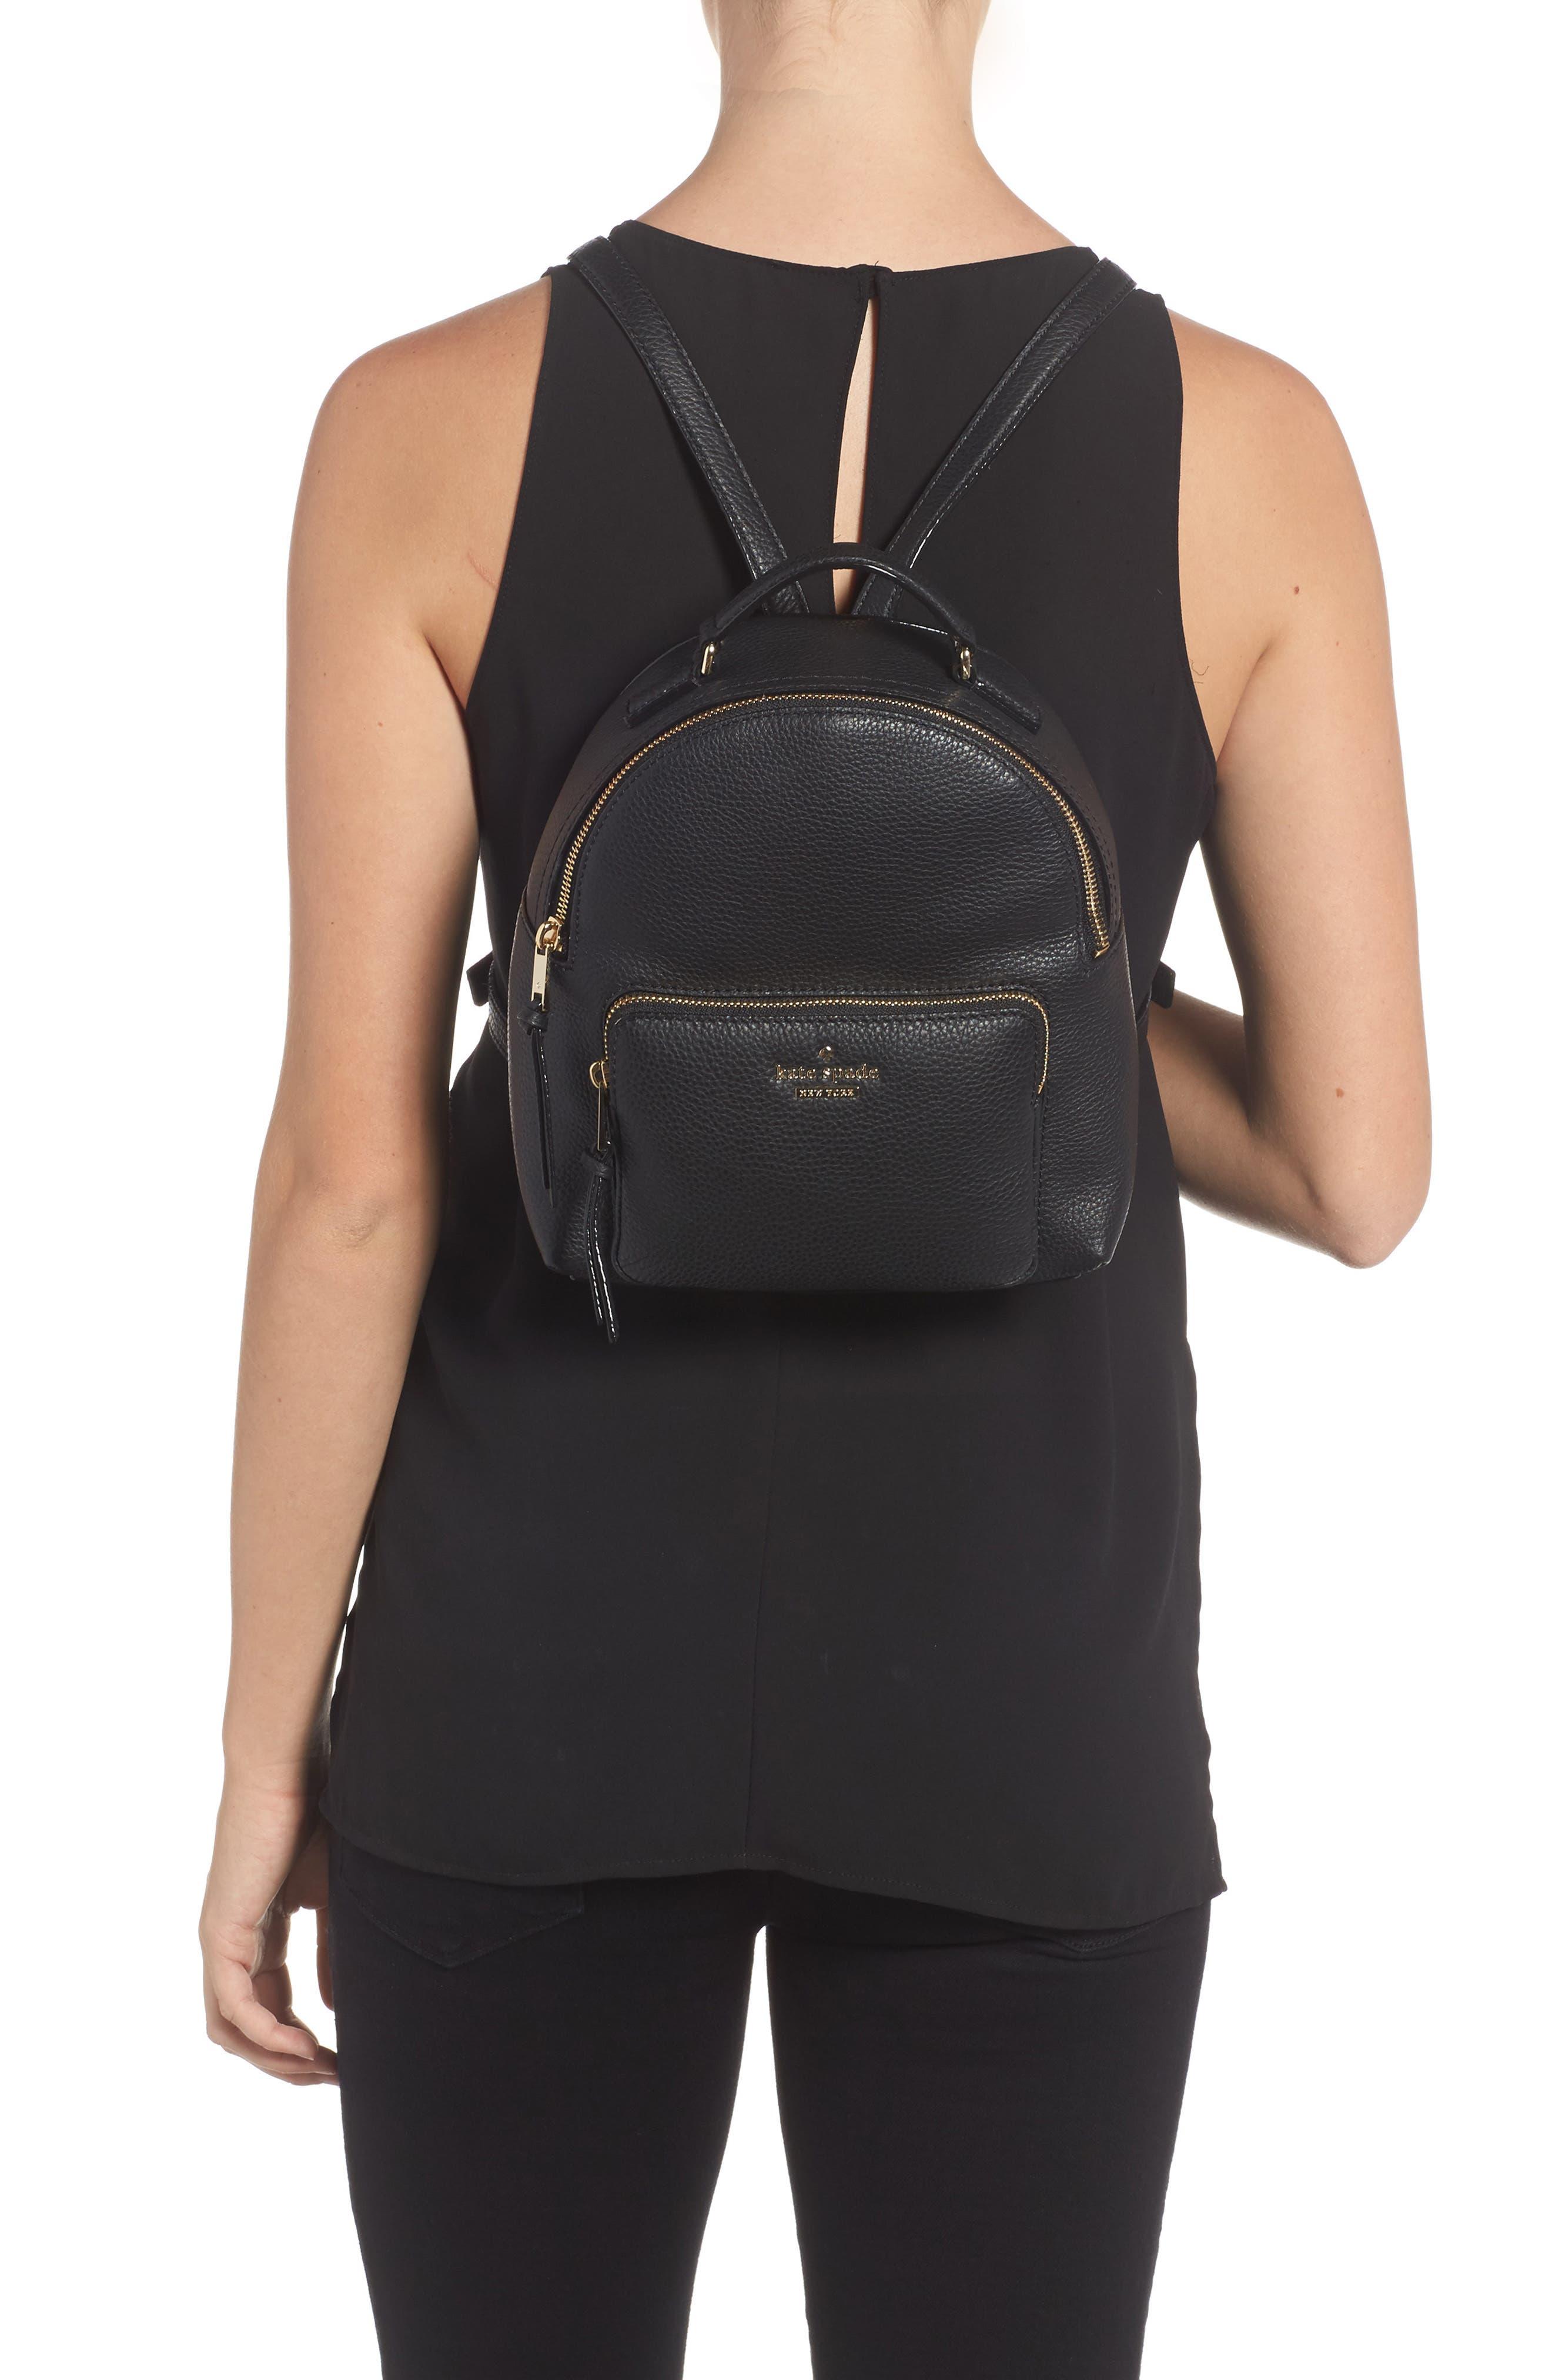 KATE SPADE NEW YORK, jackson street - keleigh leather backpack, Alternate thumbnail 2, color, 001